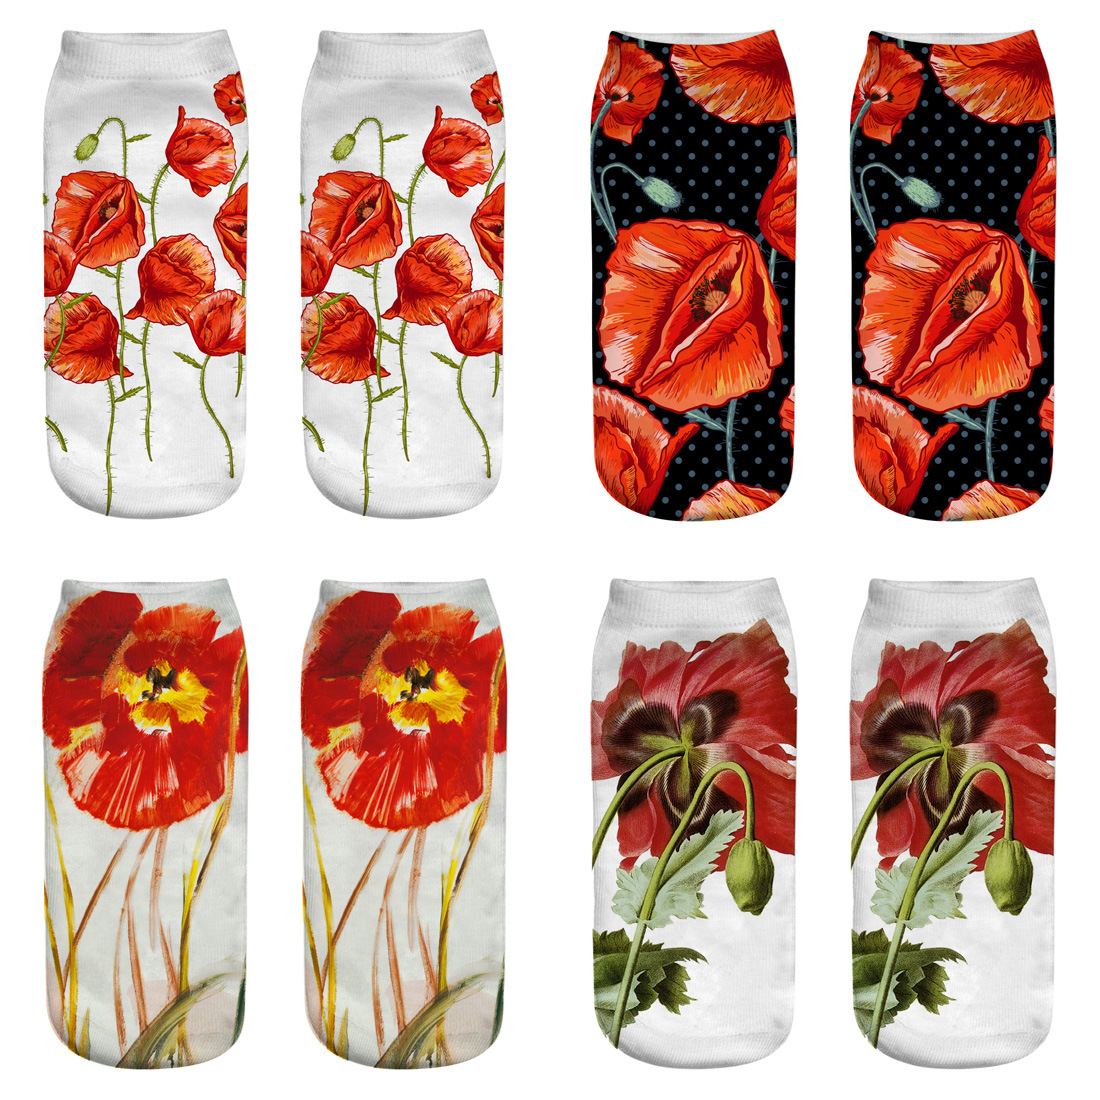 RUNNING CHICK New Poppy 3d Printed Socks 2018 New Fashion